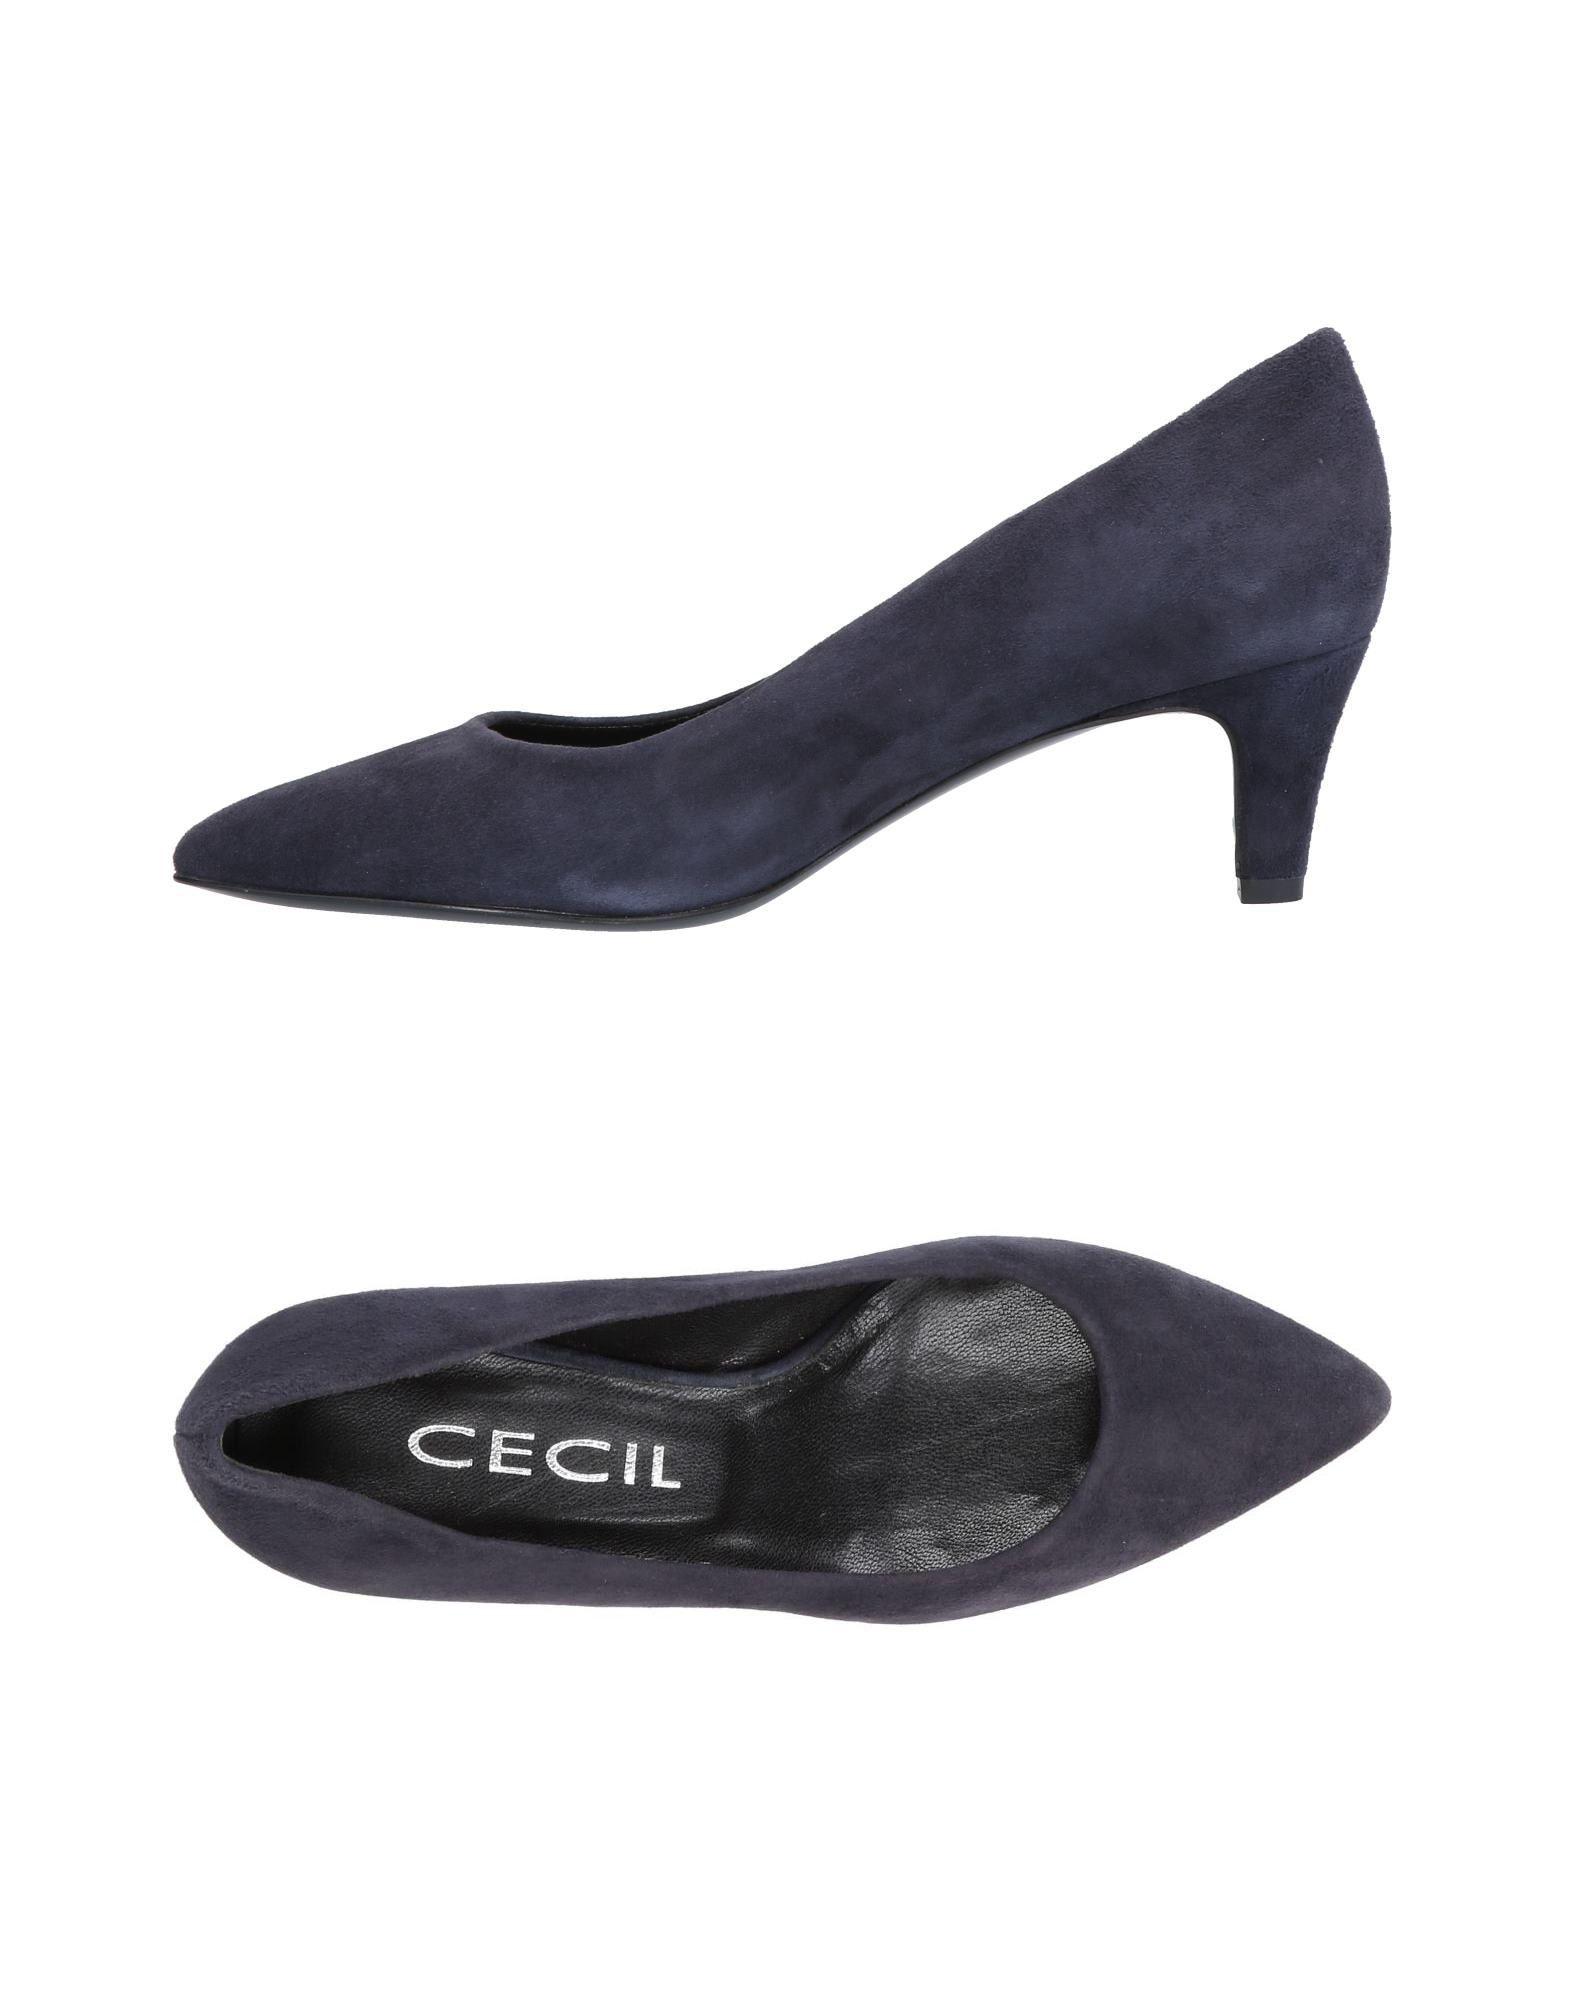 Cecil Pumps Damen  11484487XK Gute Qualität beliebte Schuhe